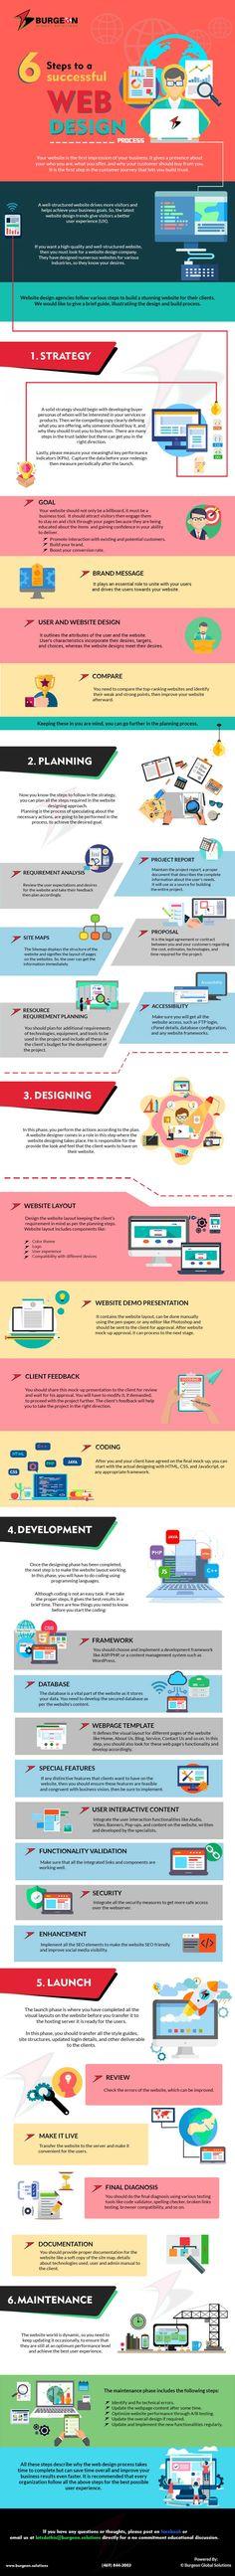 6 Steps to a Successful Website Design Process [Infographic] More Followers On Instagram, Get More Followers, Process Infographic, Infographics, Ppt Presentation Slides, Website Design Company, Business Design, Design Process, Digital Marketing